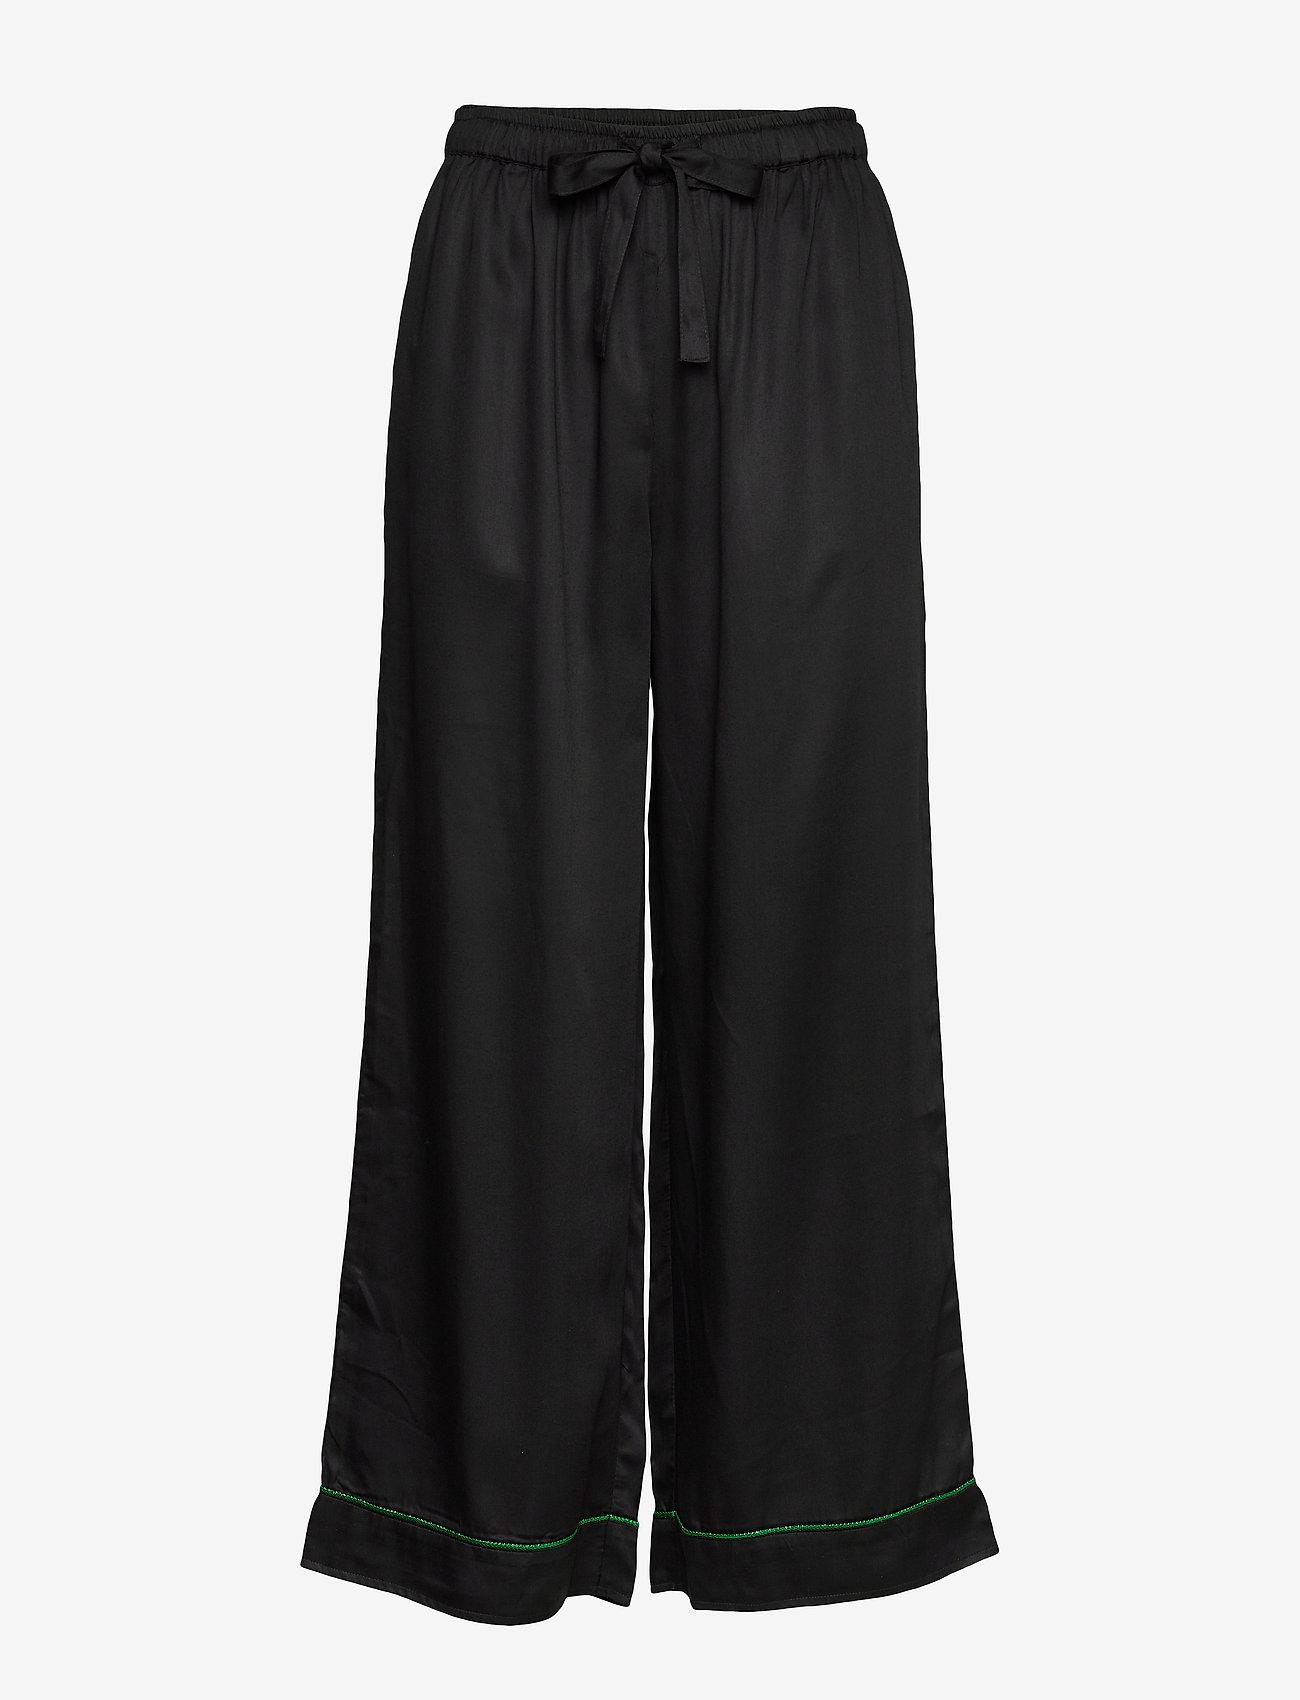 Underprotection - lisa pants - doły - black - 0